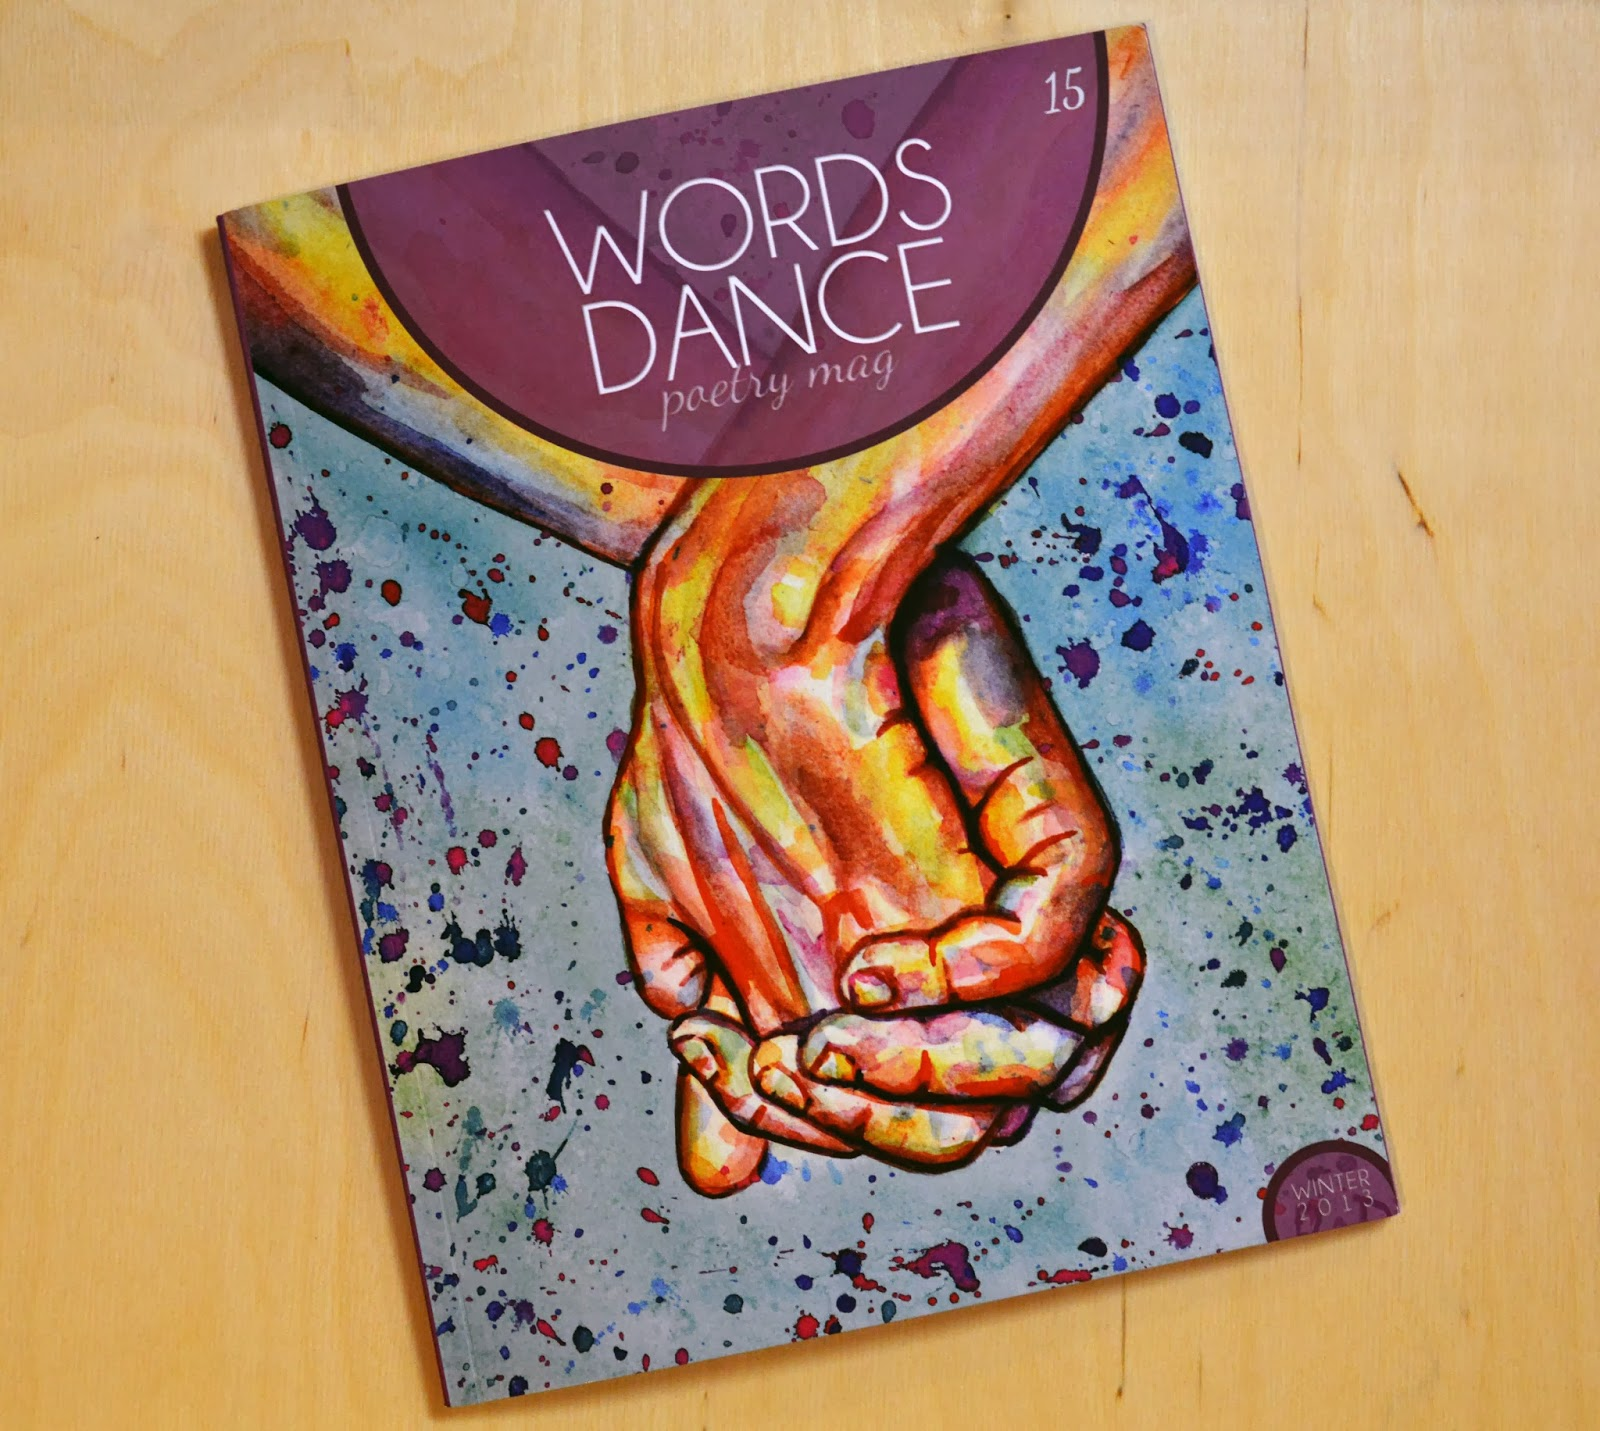 http://wordsdance.com/words-dance-issue-15/